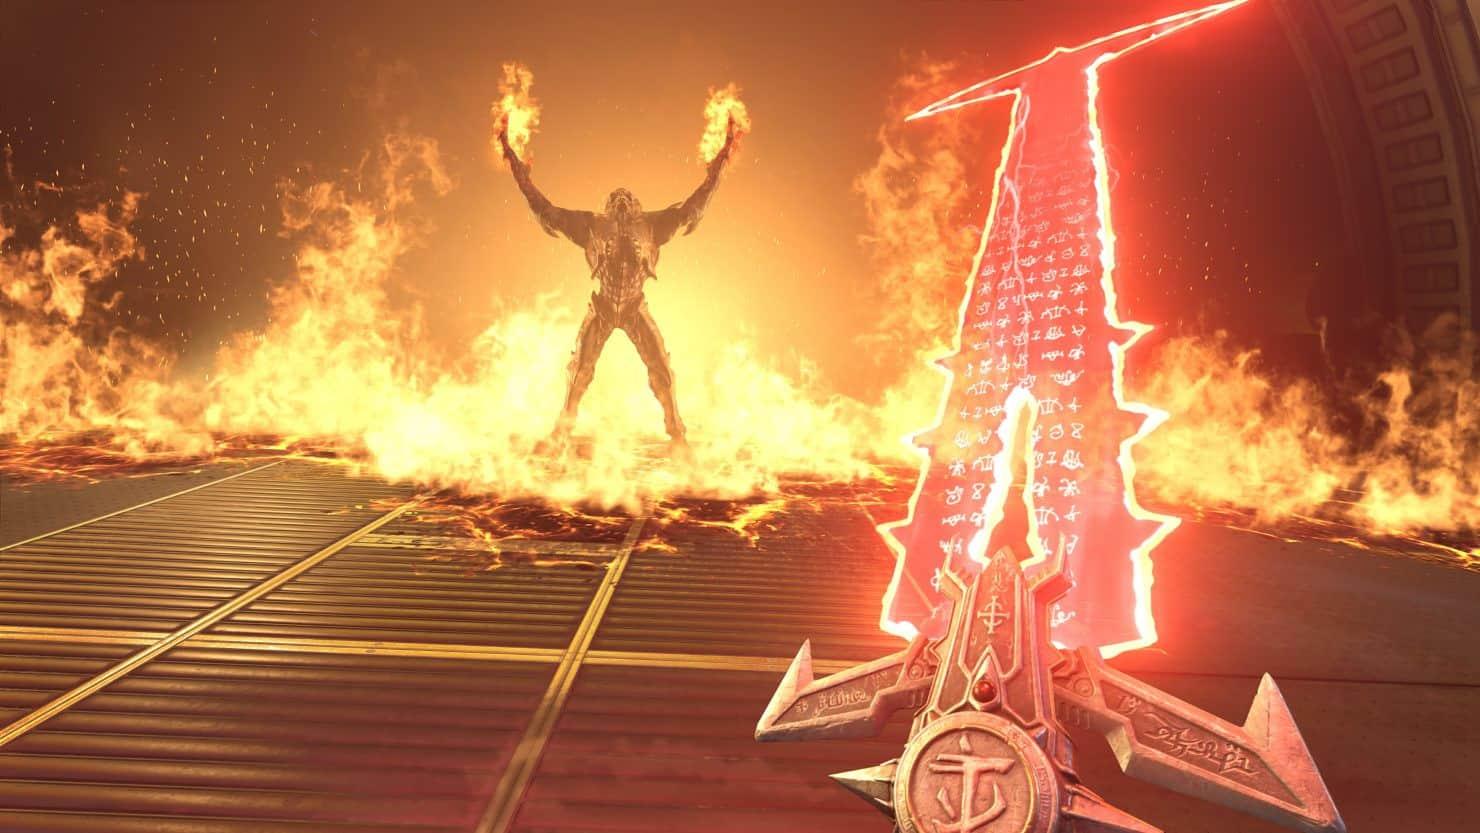 doom eternal 7 - DOOM Eternal - Primi dettagli, Immagini e gameplay